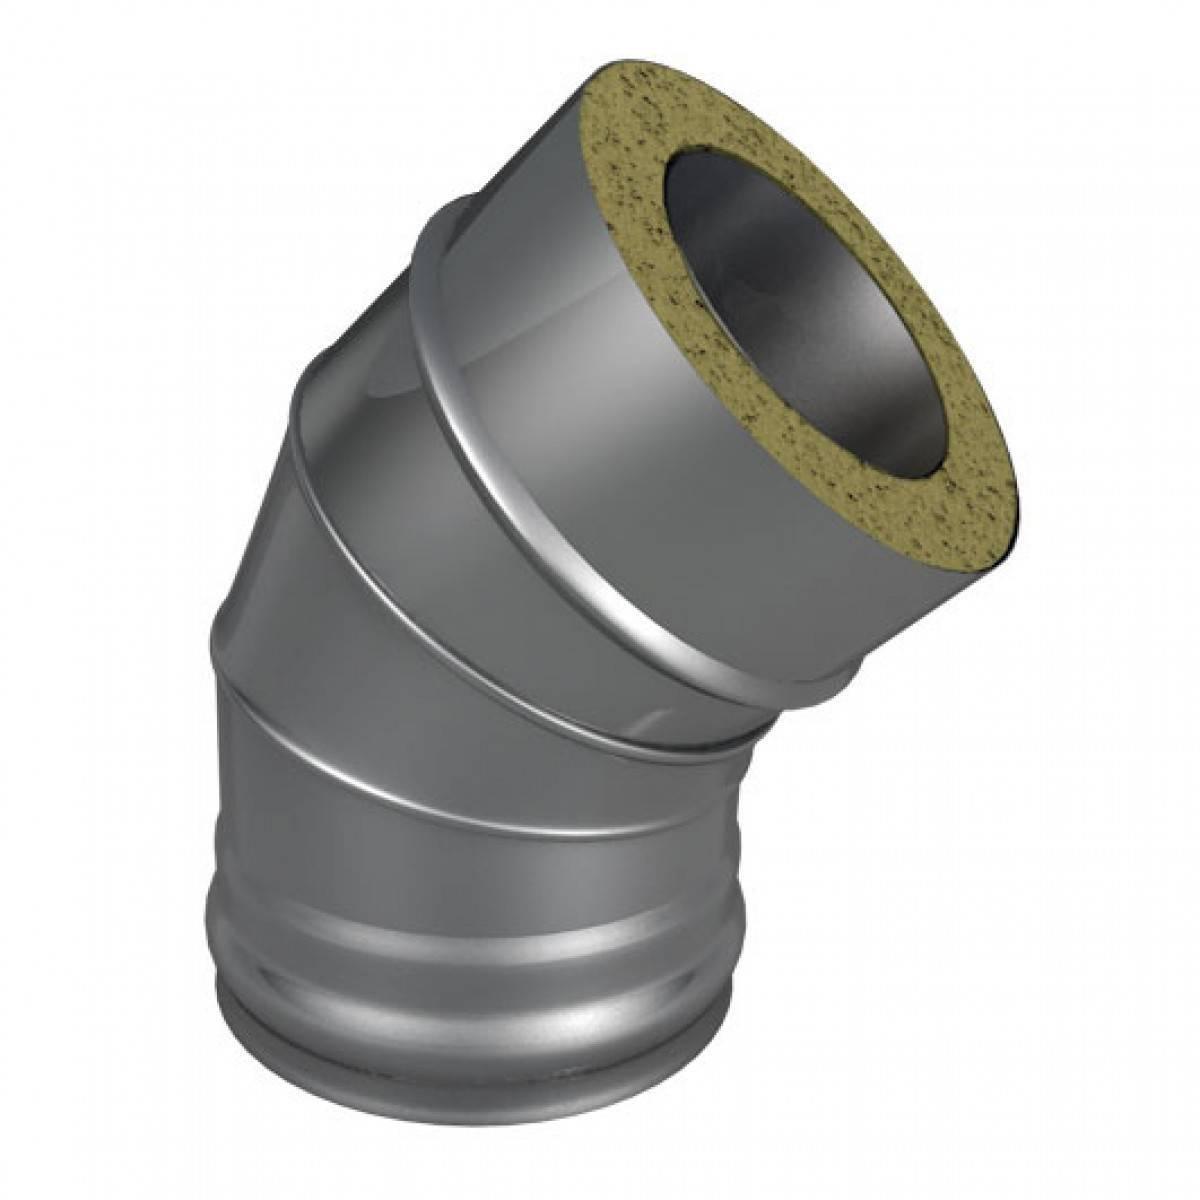 Отвод Термо (430, t0.5/ОЦ, t0.5) 45º, d100/D200(Раструб)